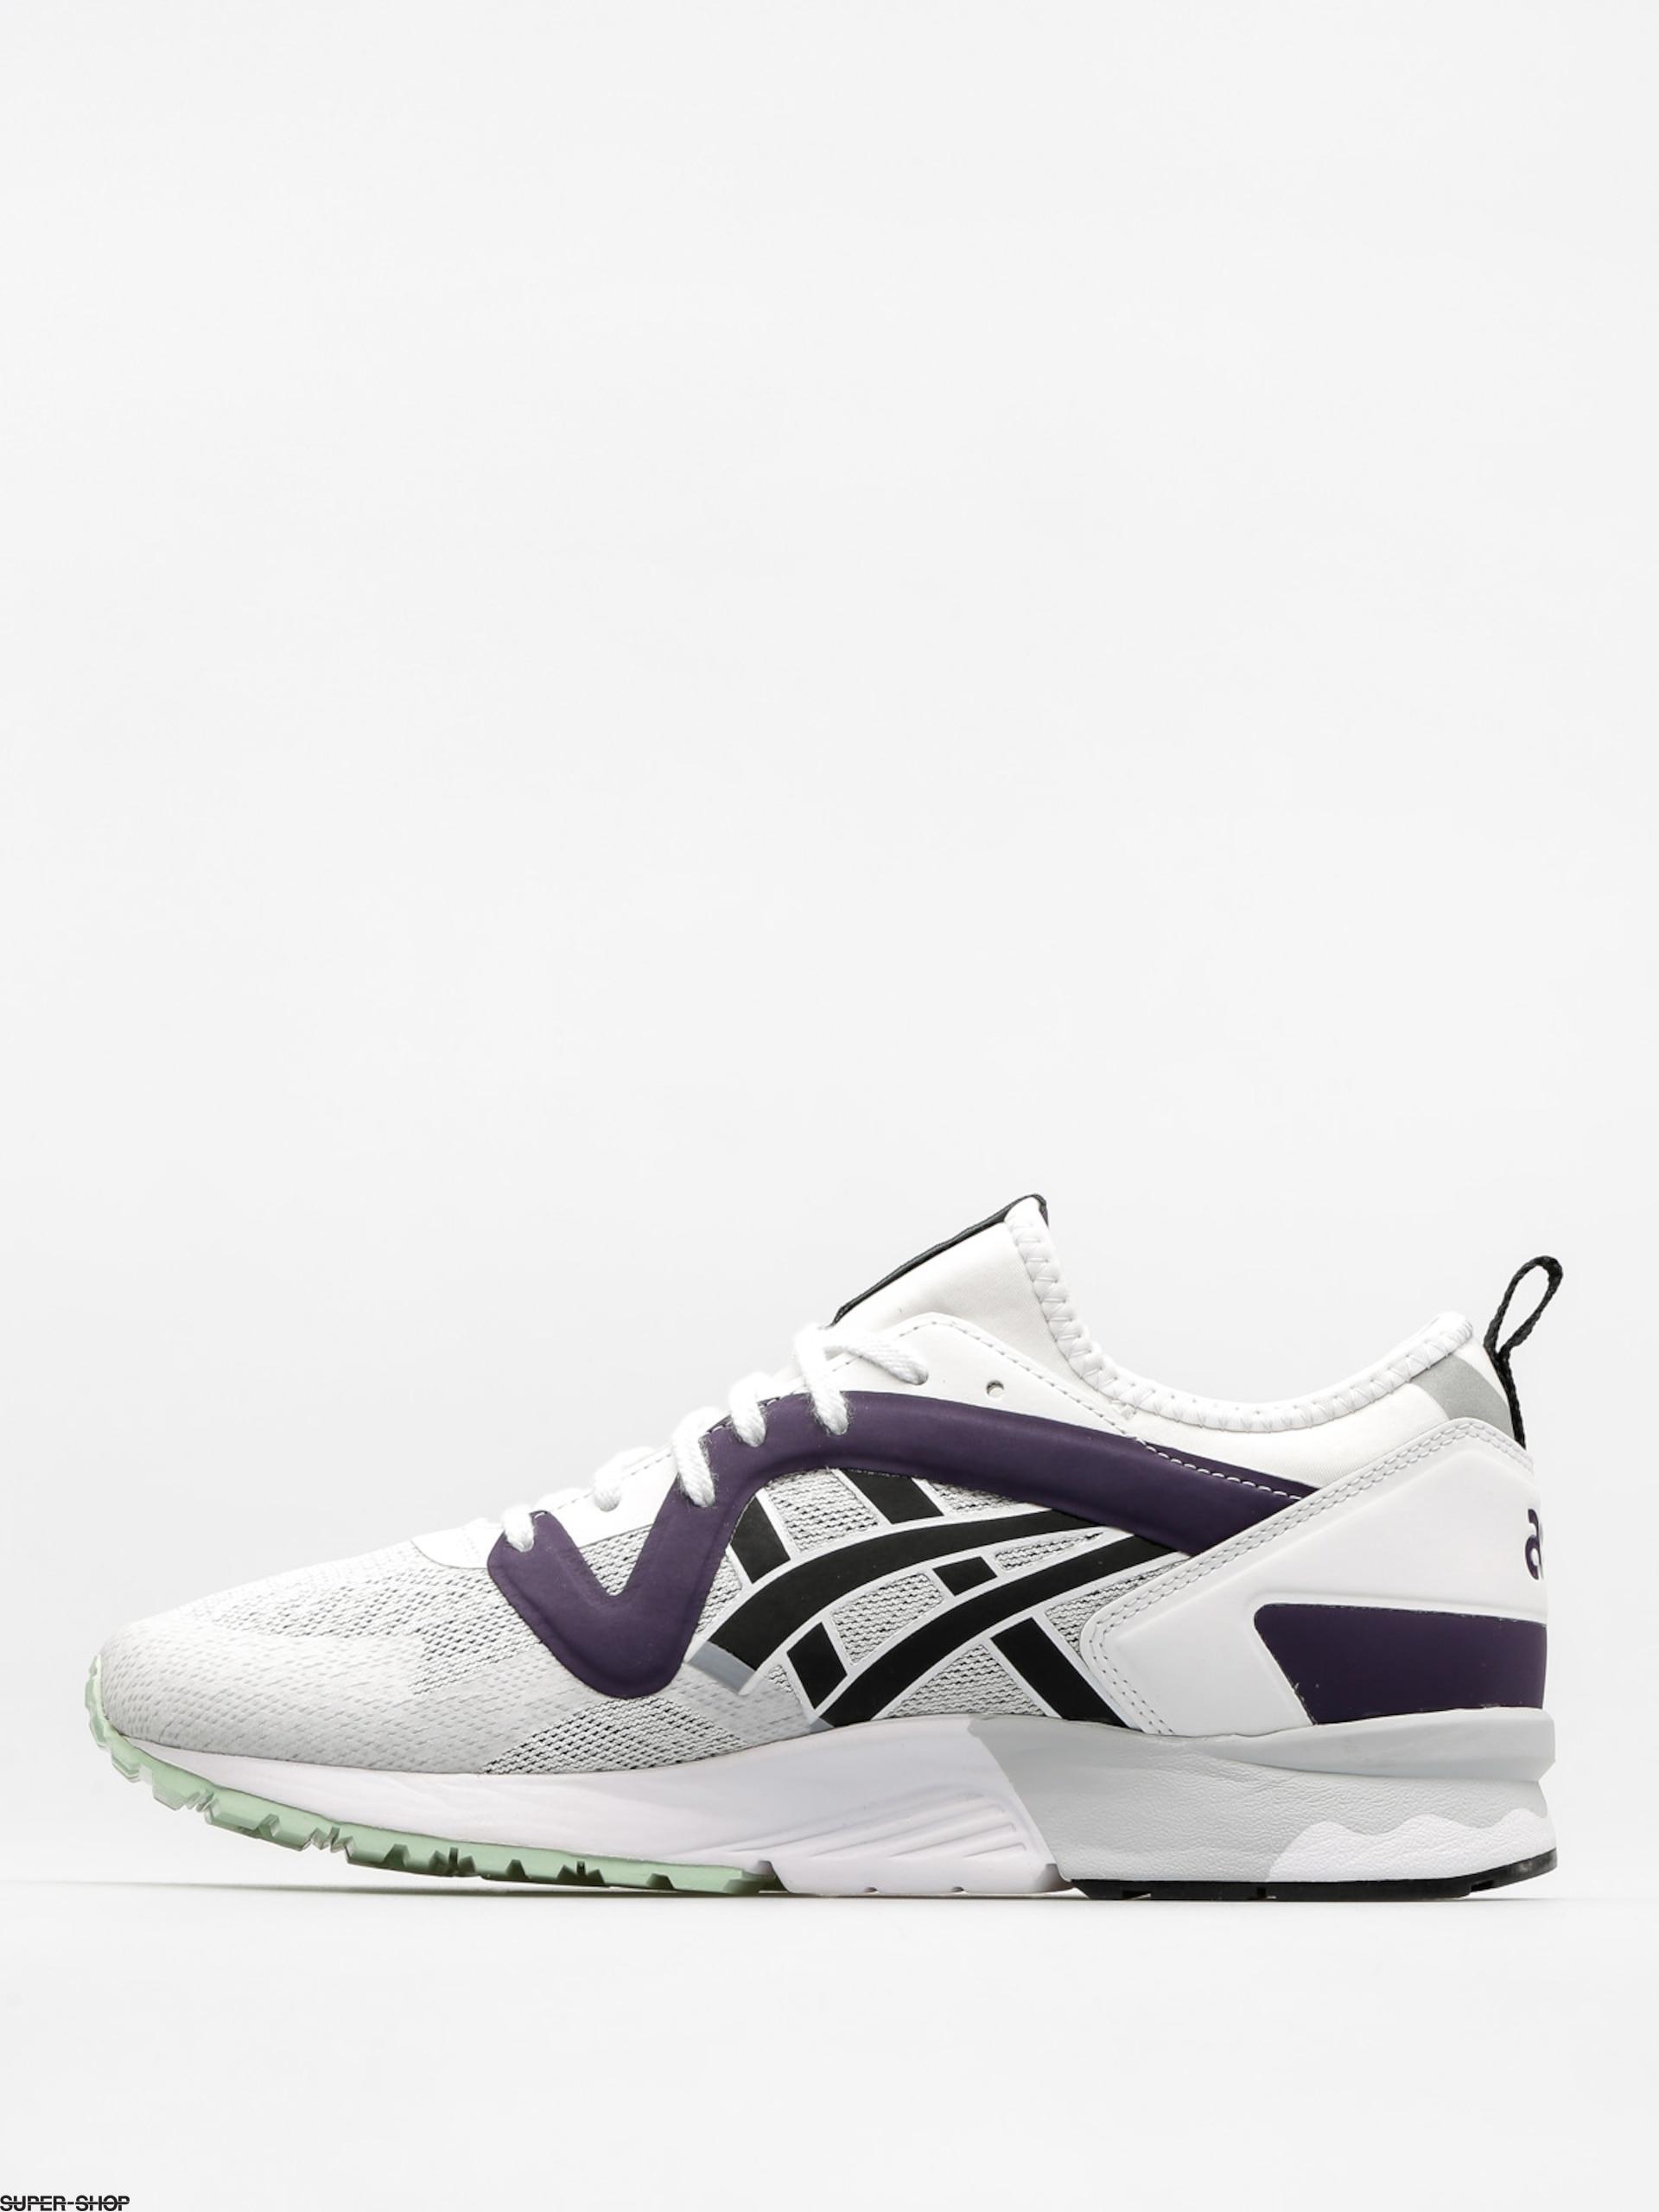 65bfa7e738b5 ... canada asics tiger shoes gel lyte v ns white black cae2e 02703